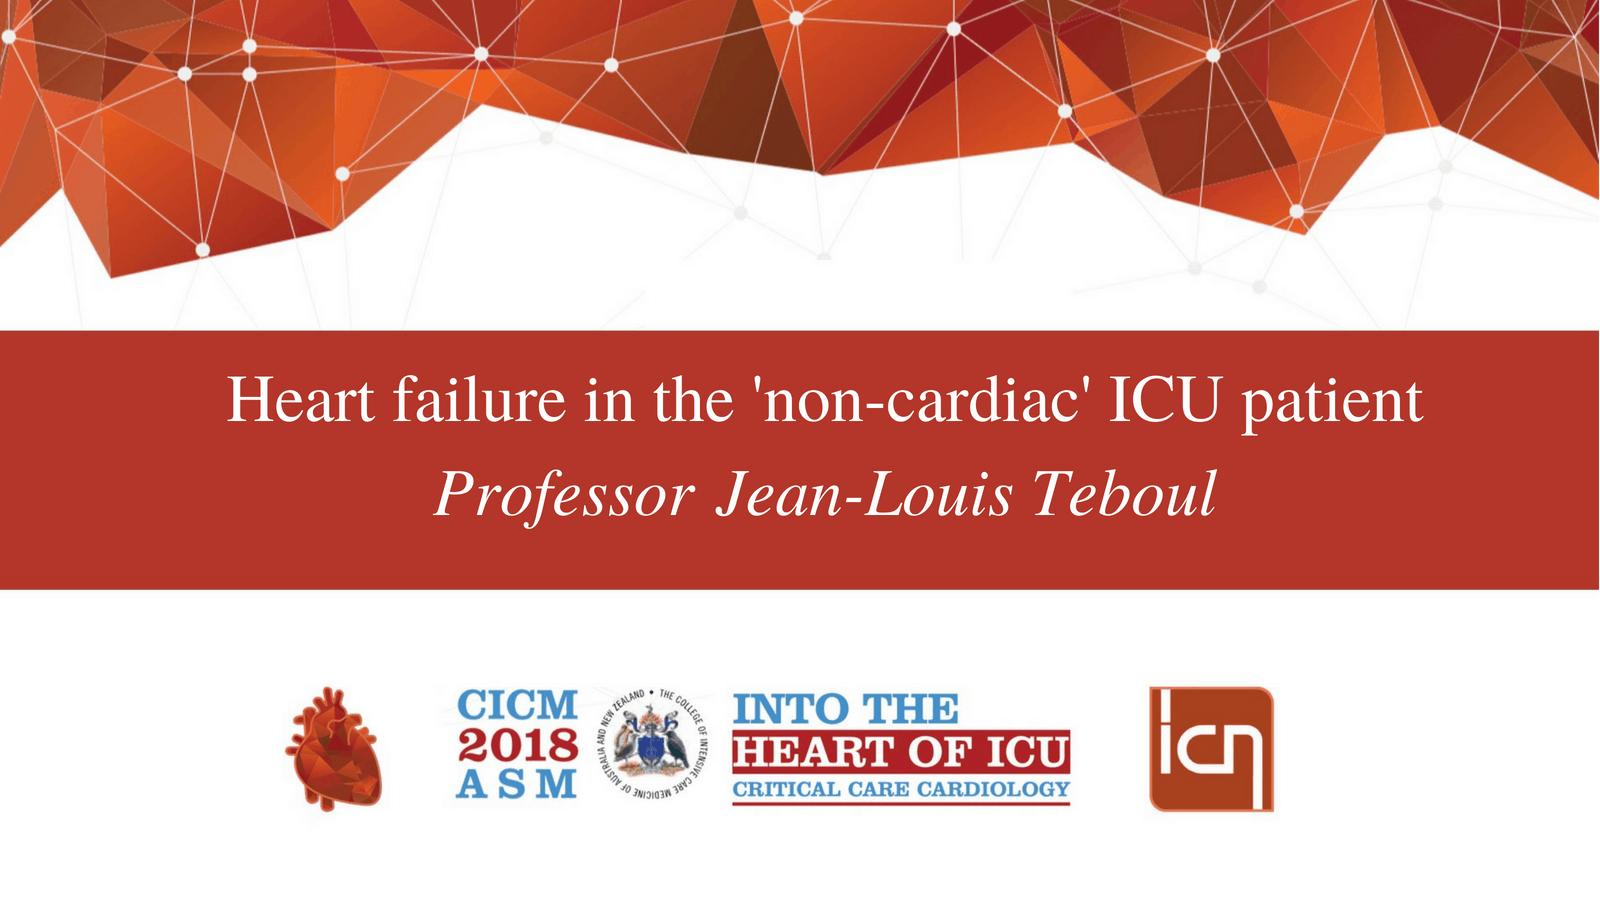 Heart failure in the 'non-cardiac' ICU patient